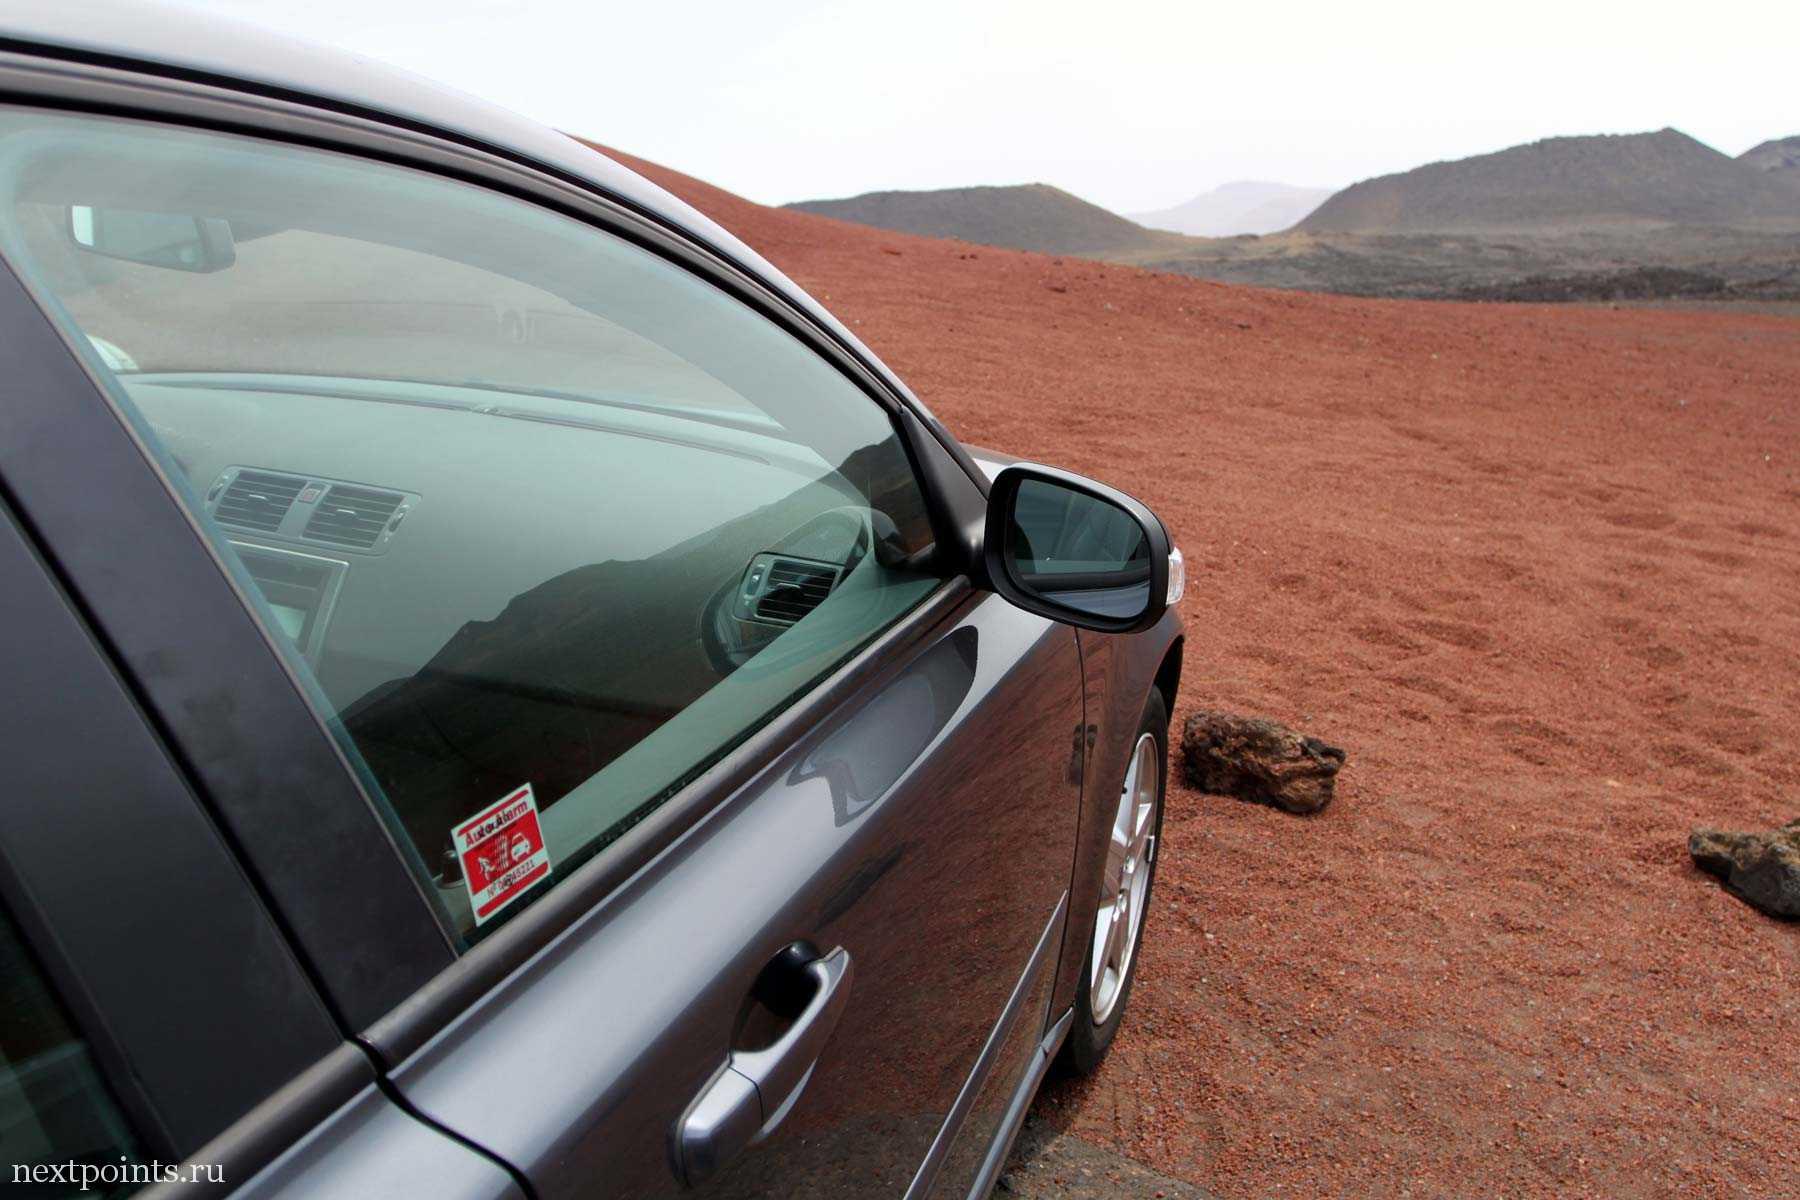 Volvo на Лансароте. Парковка Национального парка Timanfaya.